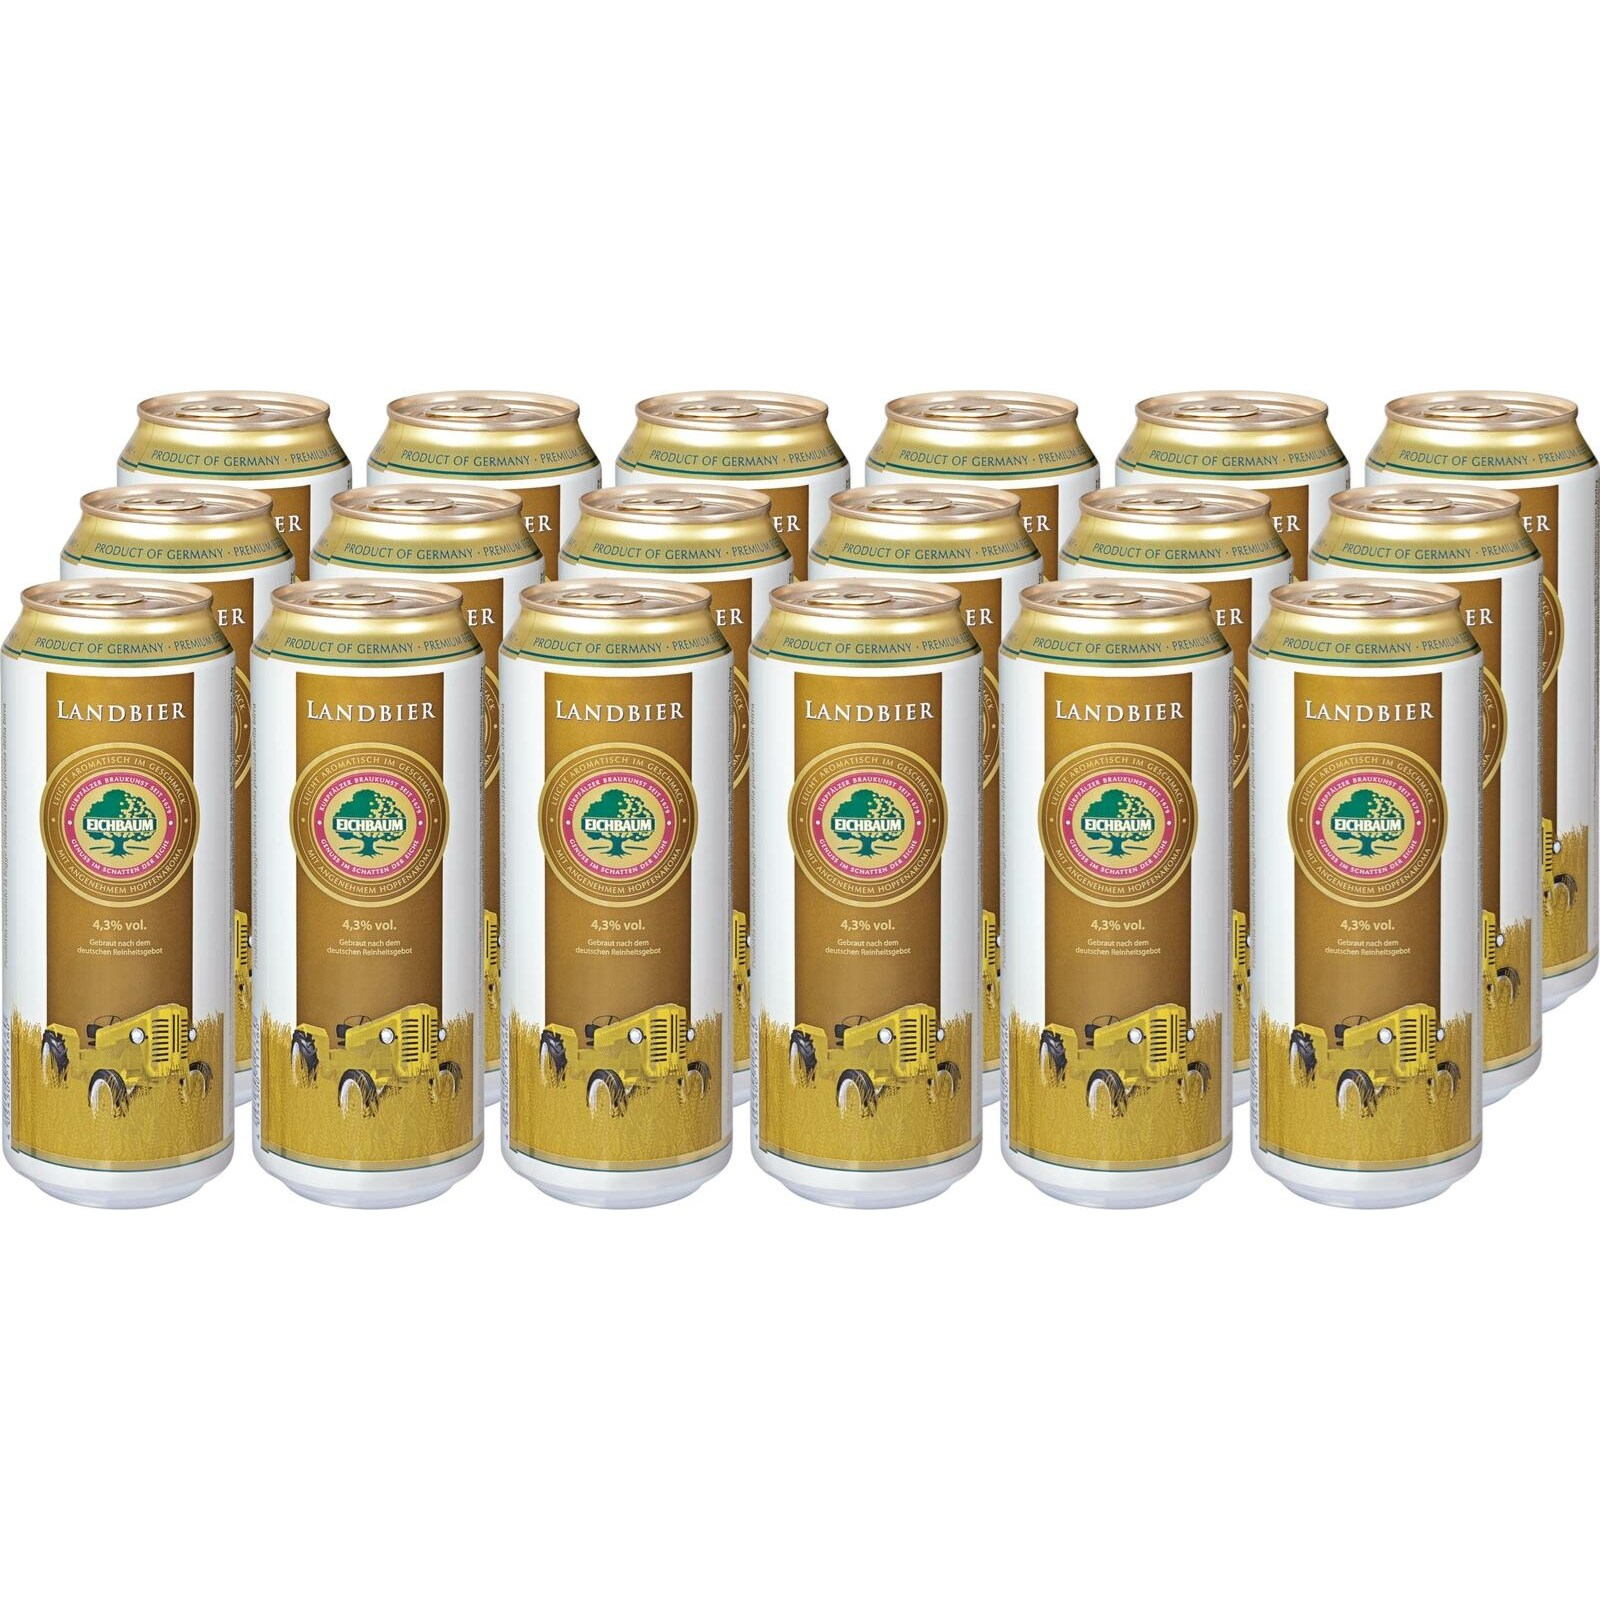 landbier eichbaum dose 18 50cl biere mit alkohol landi. Black Bedroom Furniture Sets. Home Design Ideas